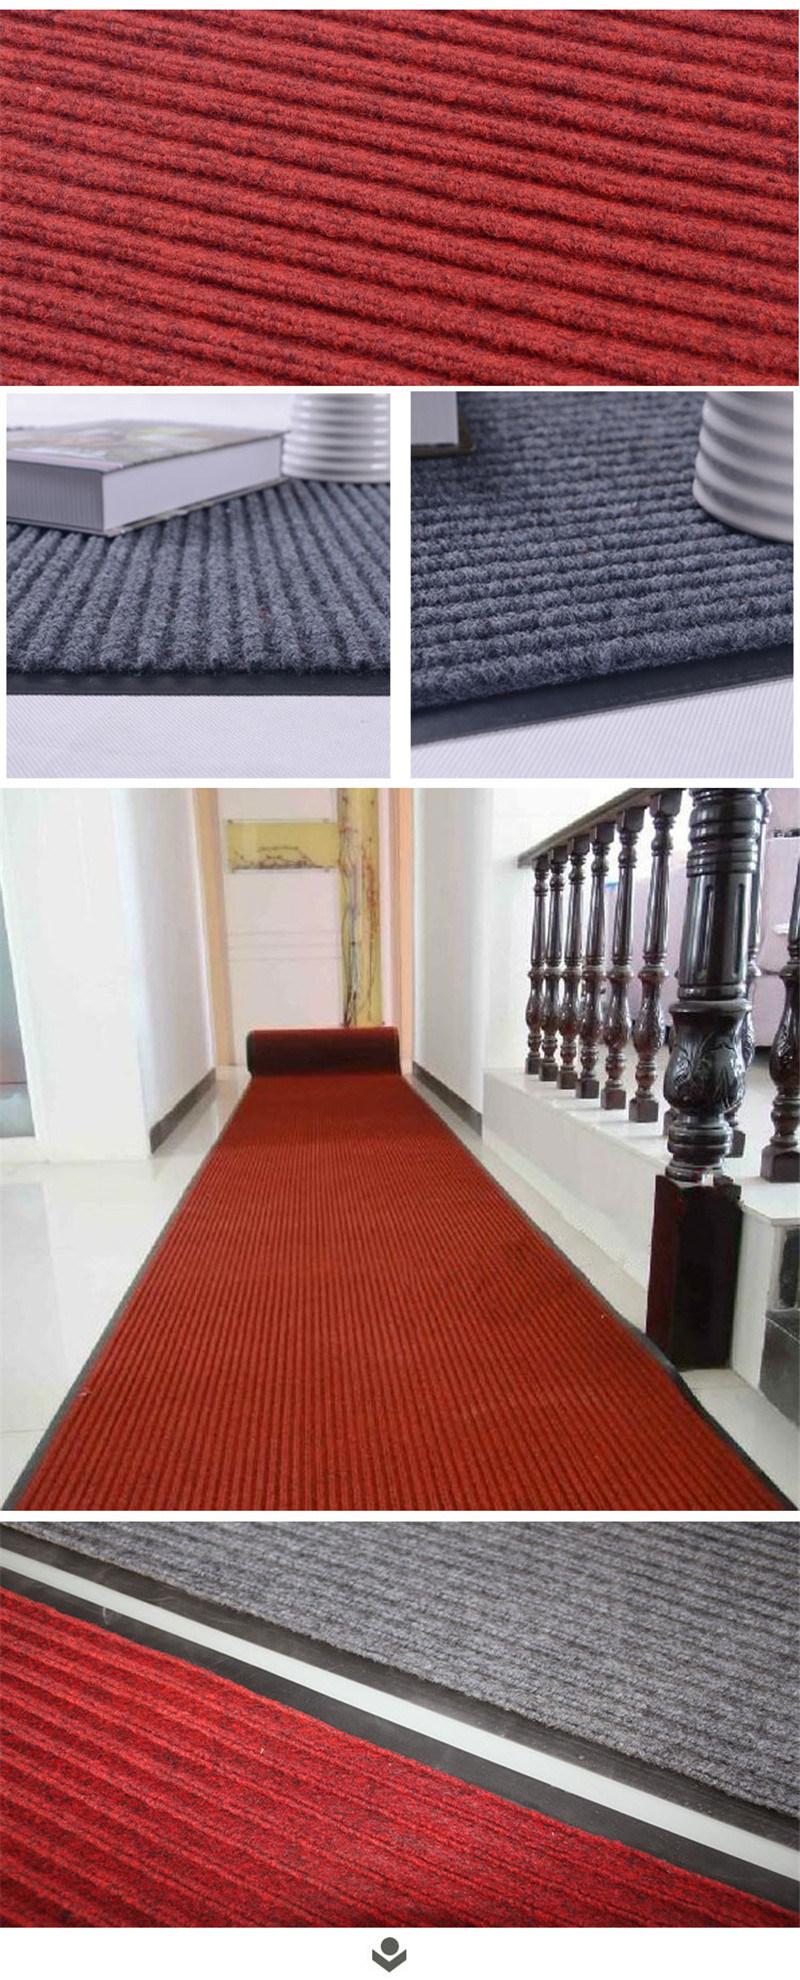 China Custom Eco Friendly Non Slip Indoor Stair Treads Carpet Mat Carpet Rug Mat From China On Topchinasupplier Com